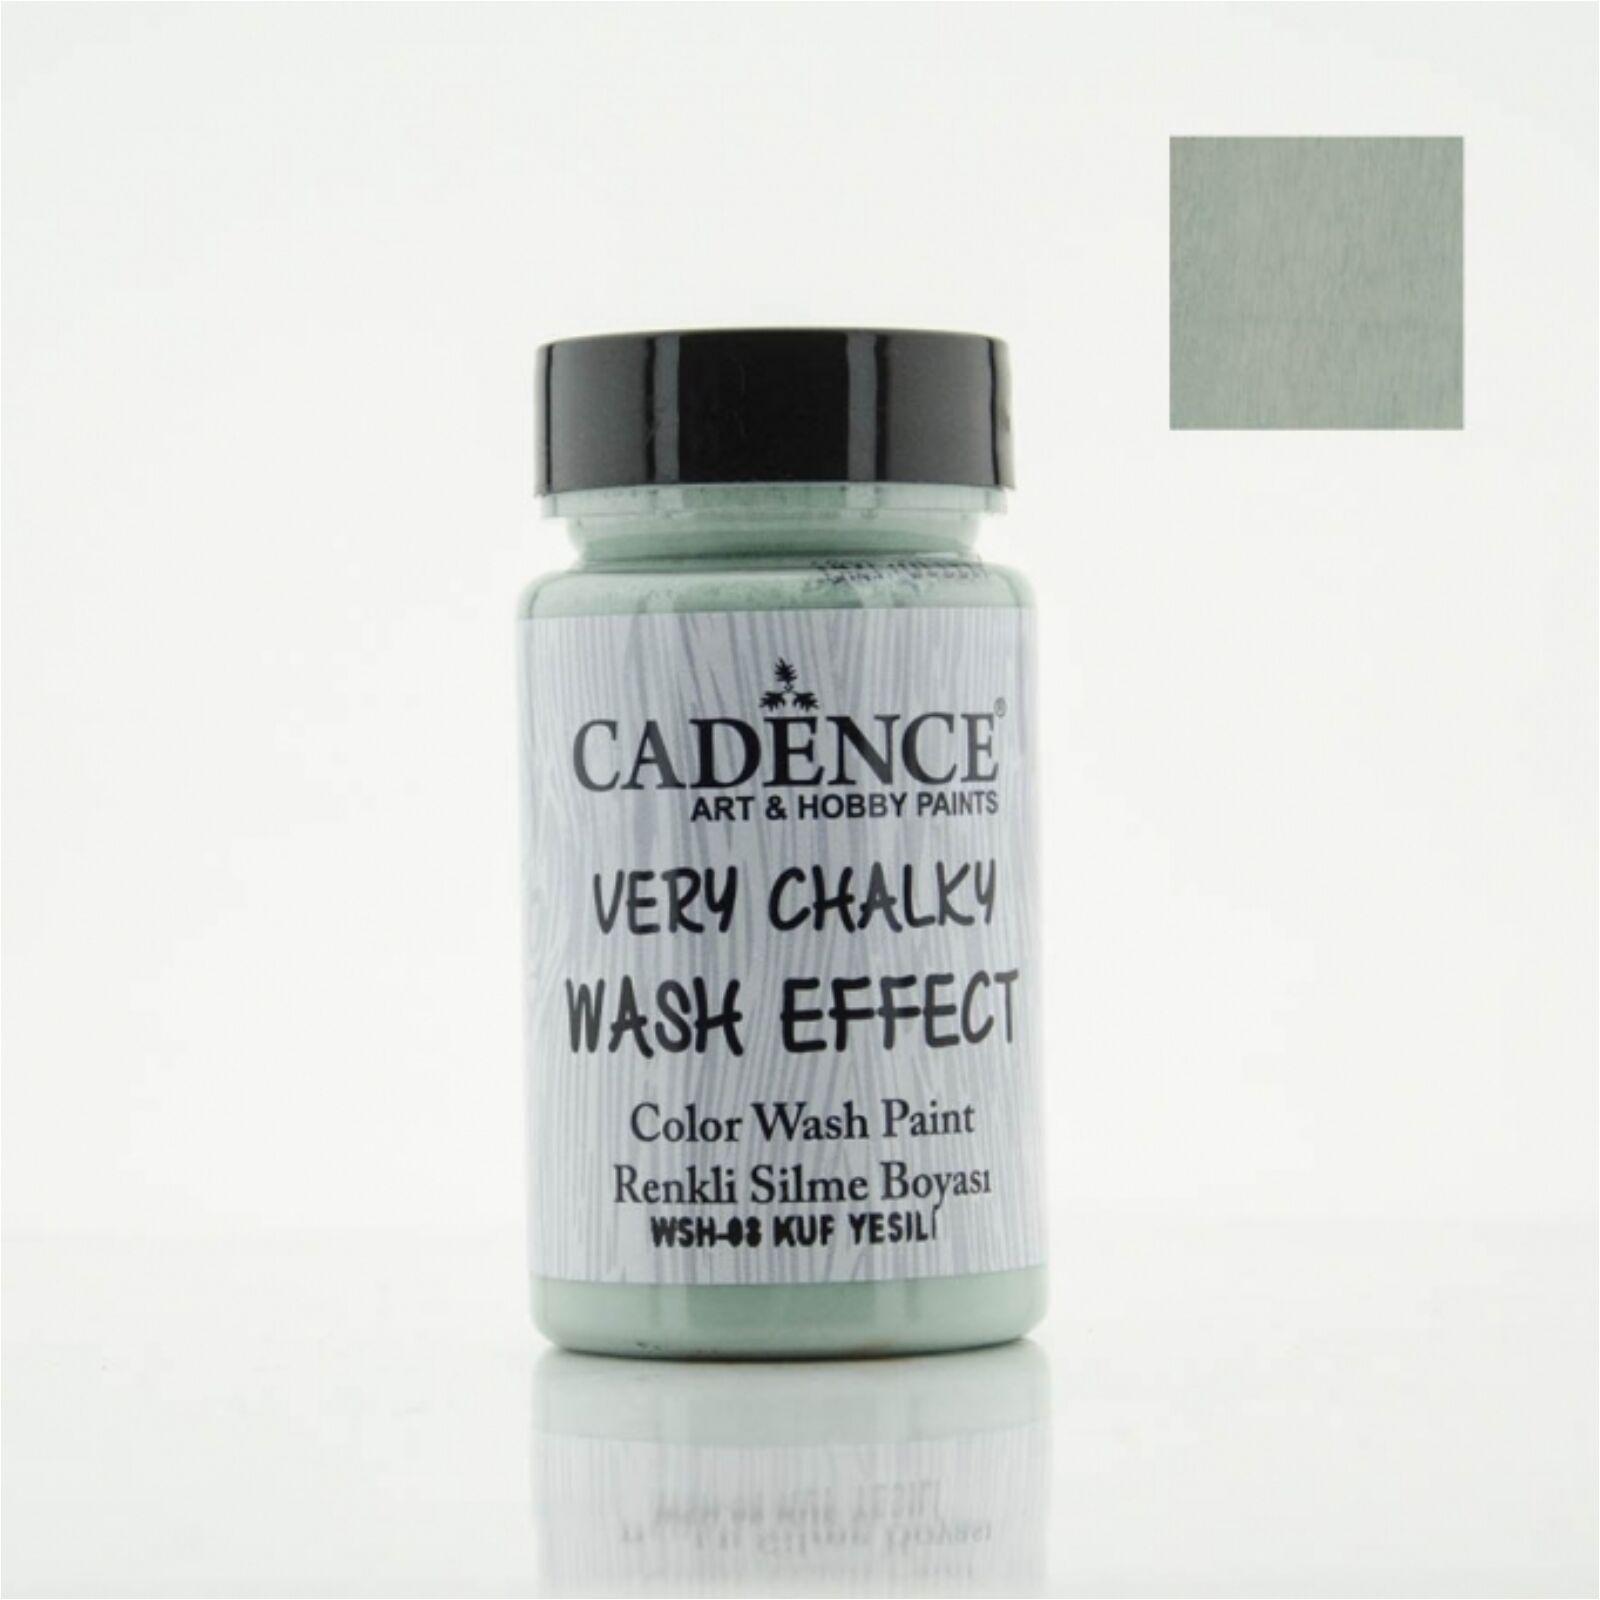 Very Chalky Wash effekt [Mold Green]